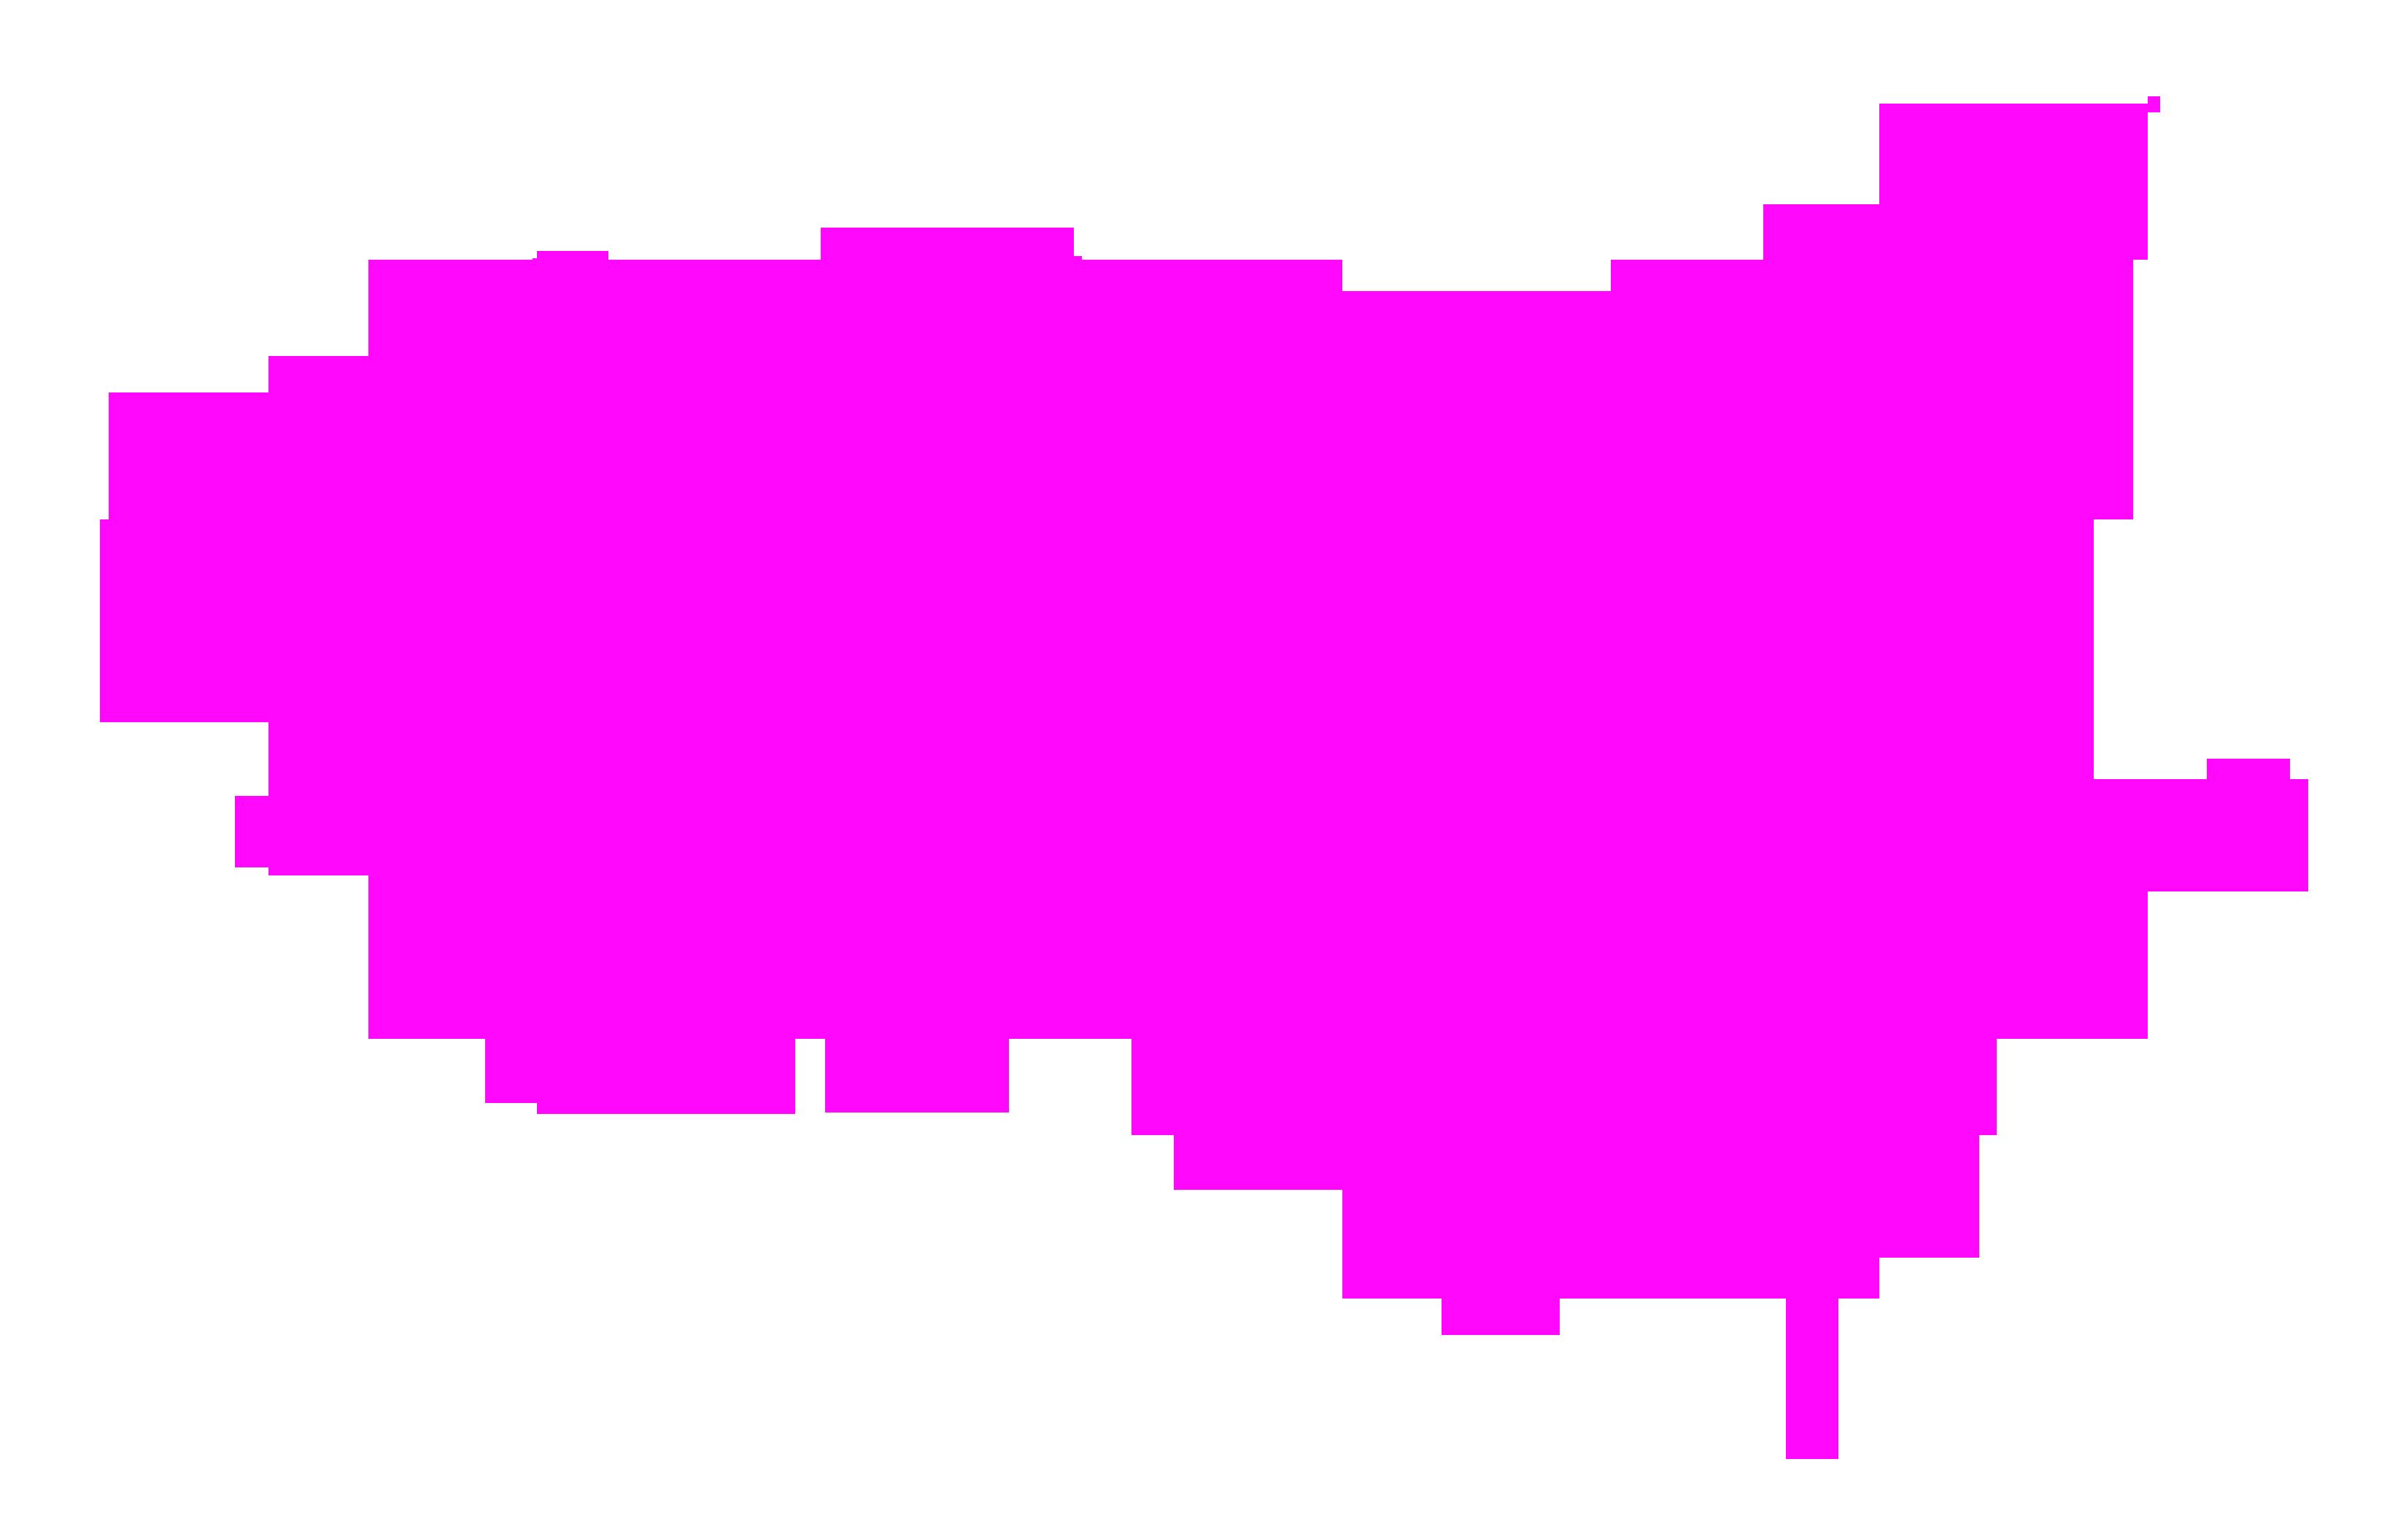 Youtube clipart beauty. Png flower designs pinterest